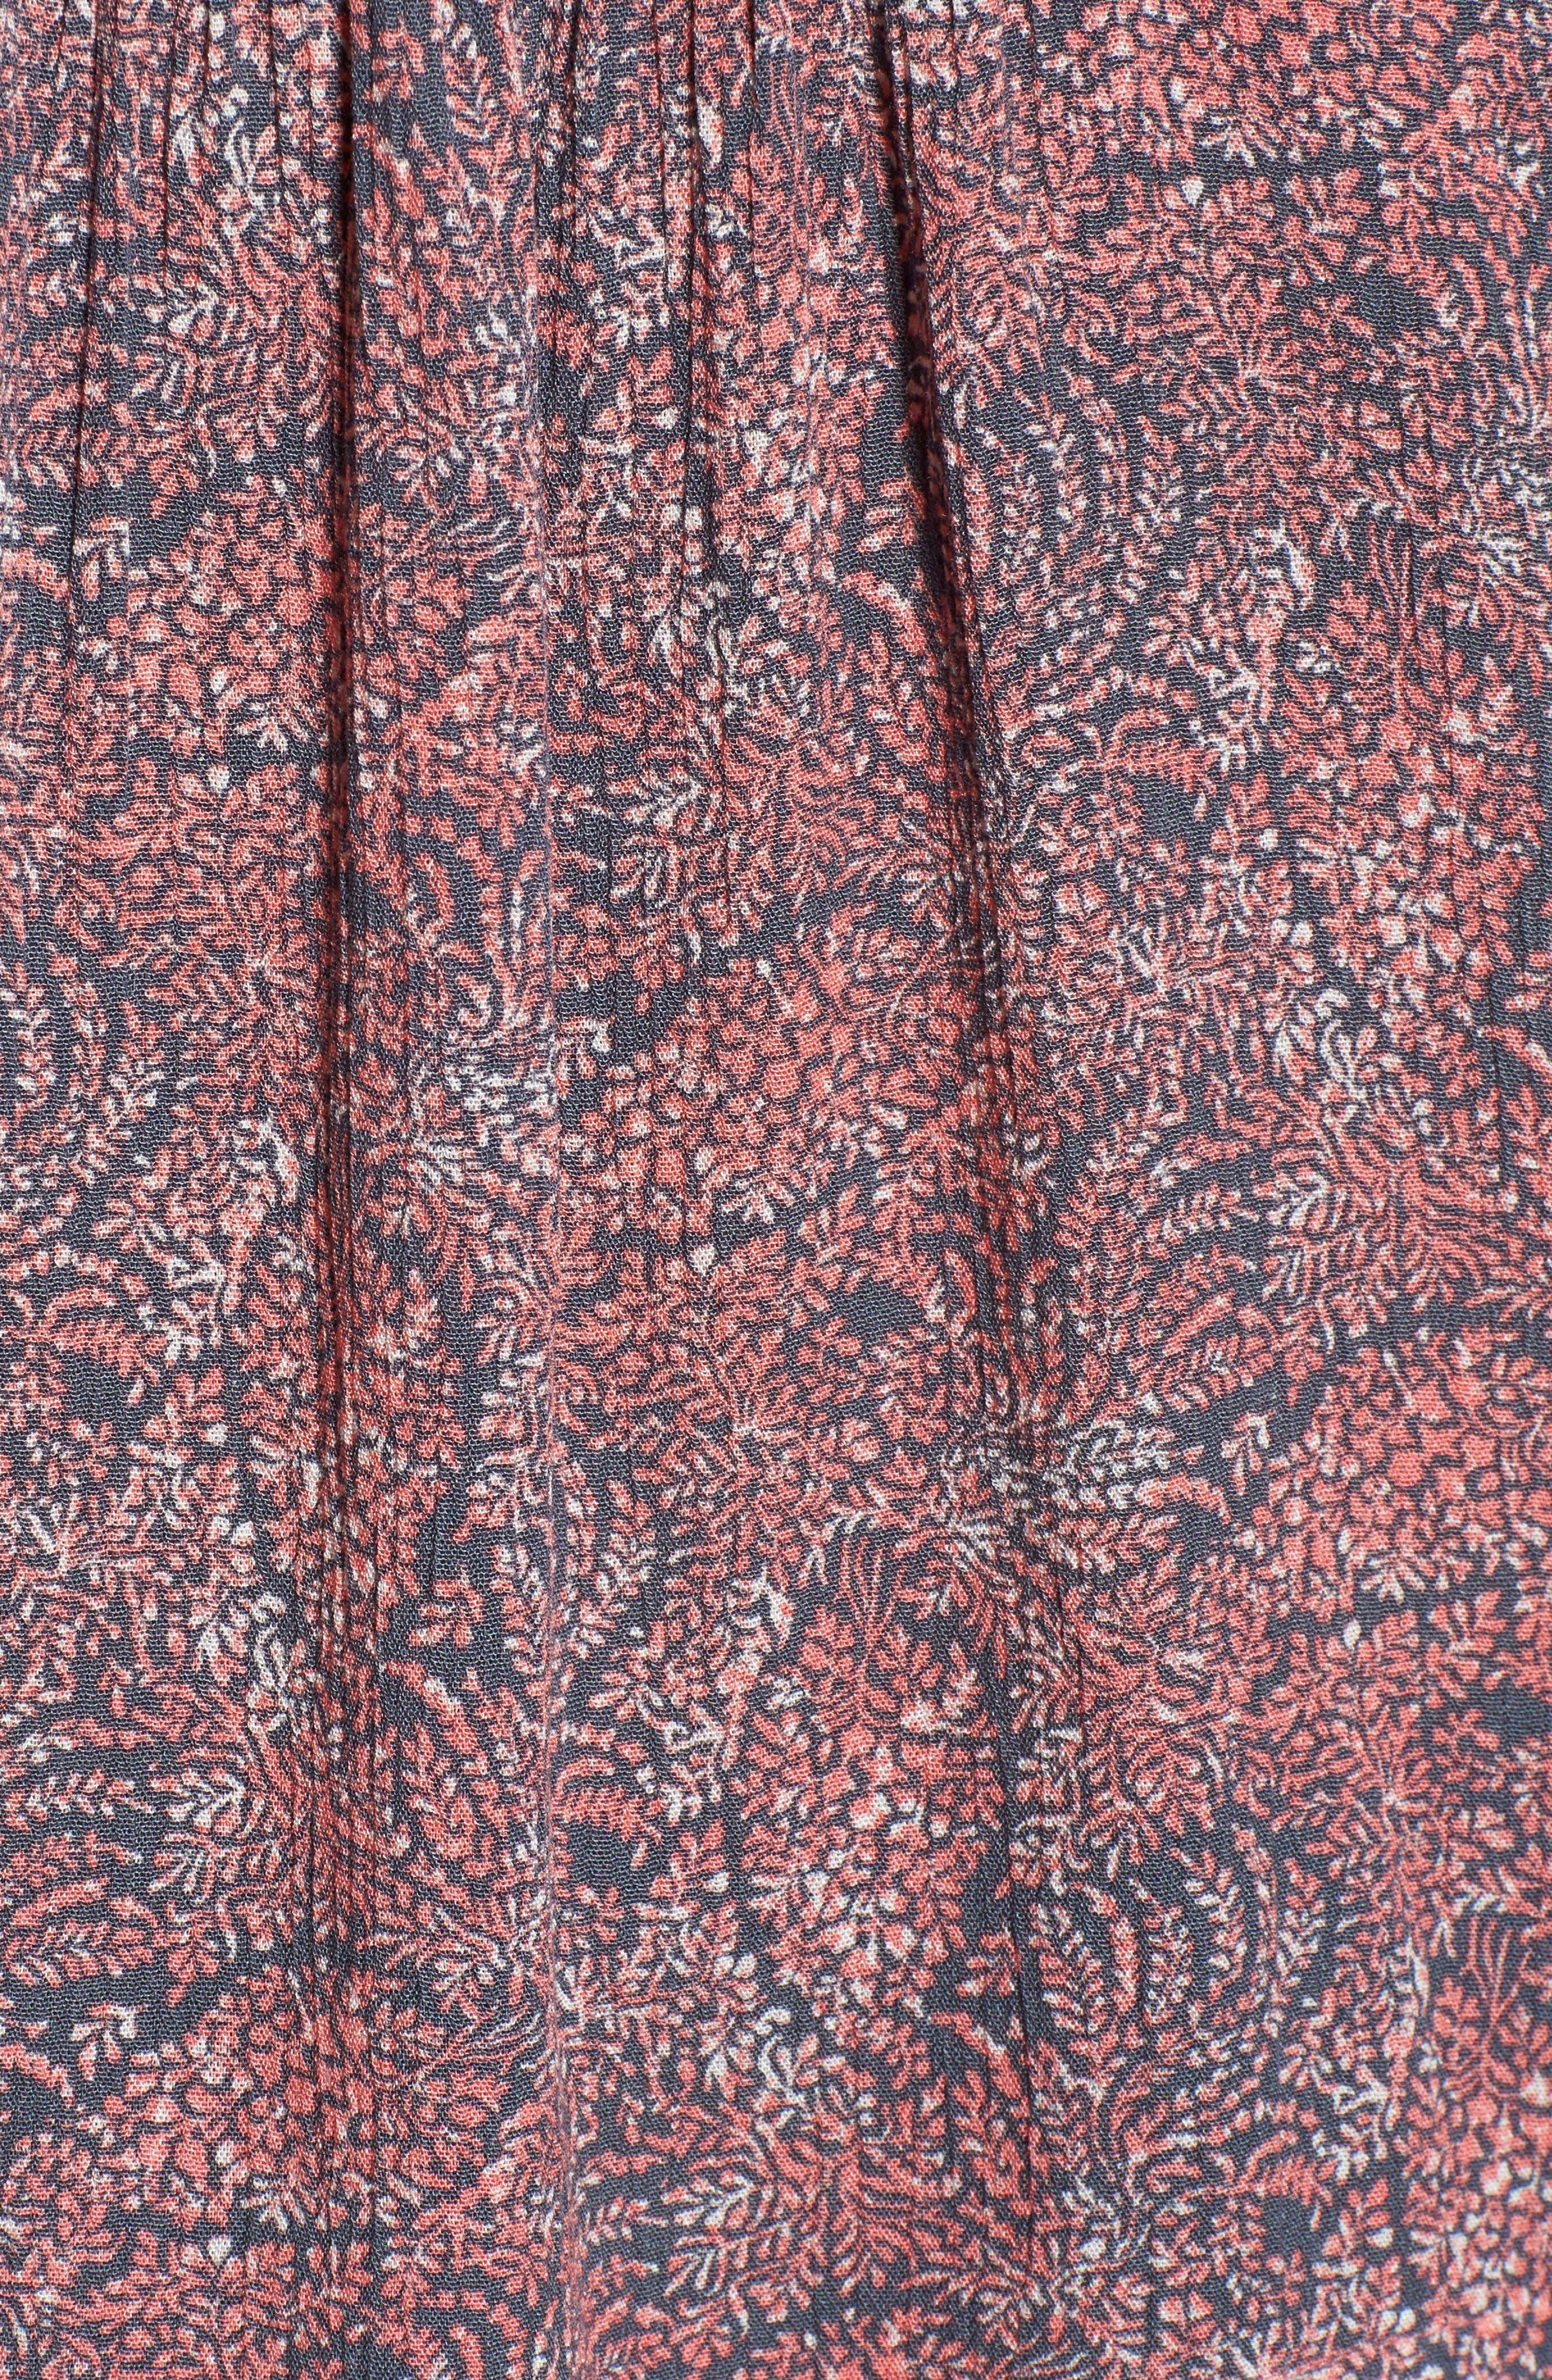 Printed Tie Sleeve Blouse,                             Alternate thumbnail 5, color,                             420